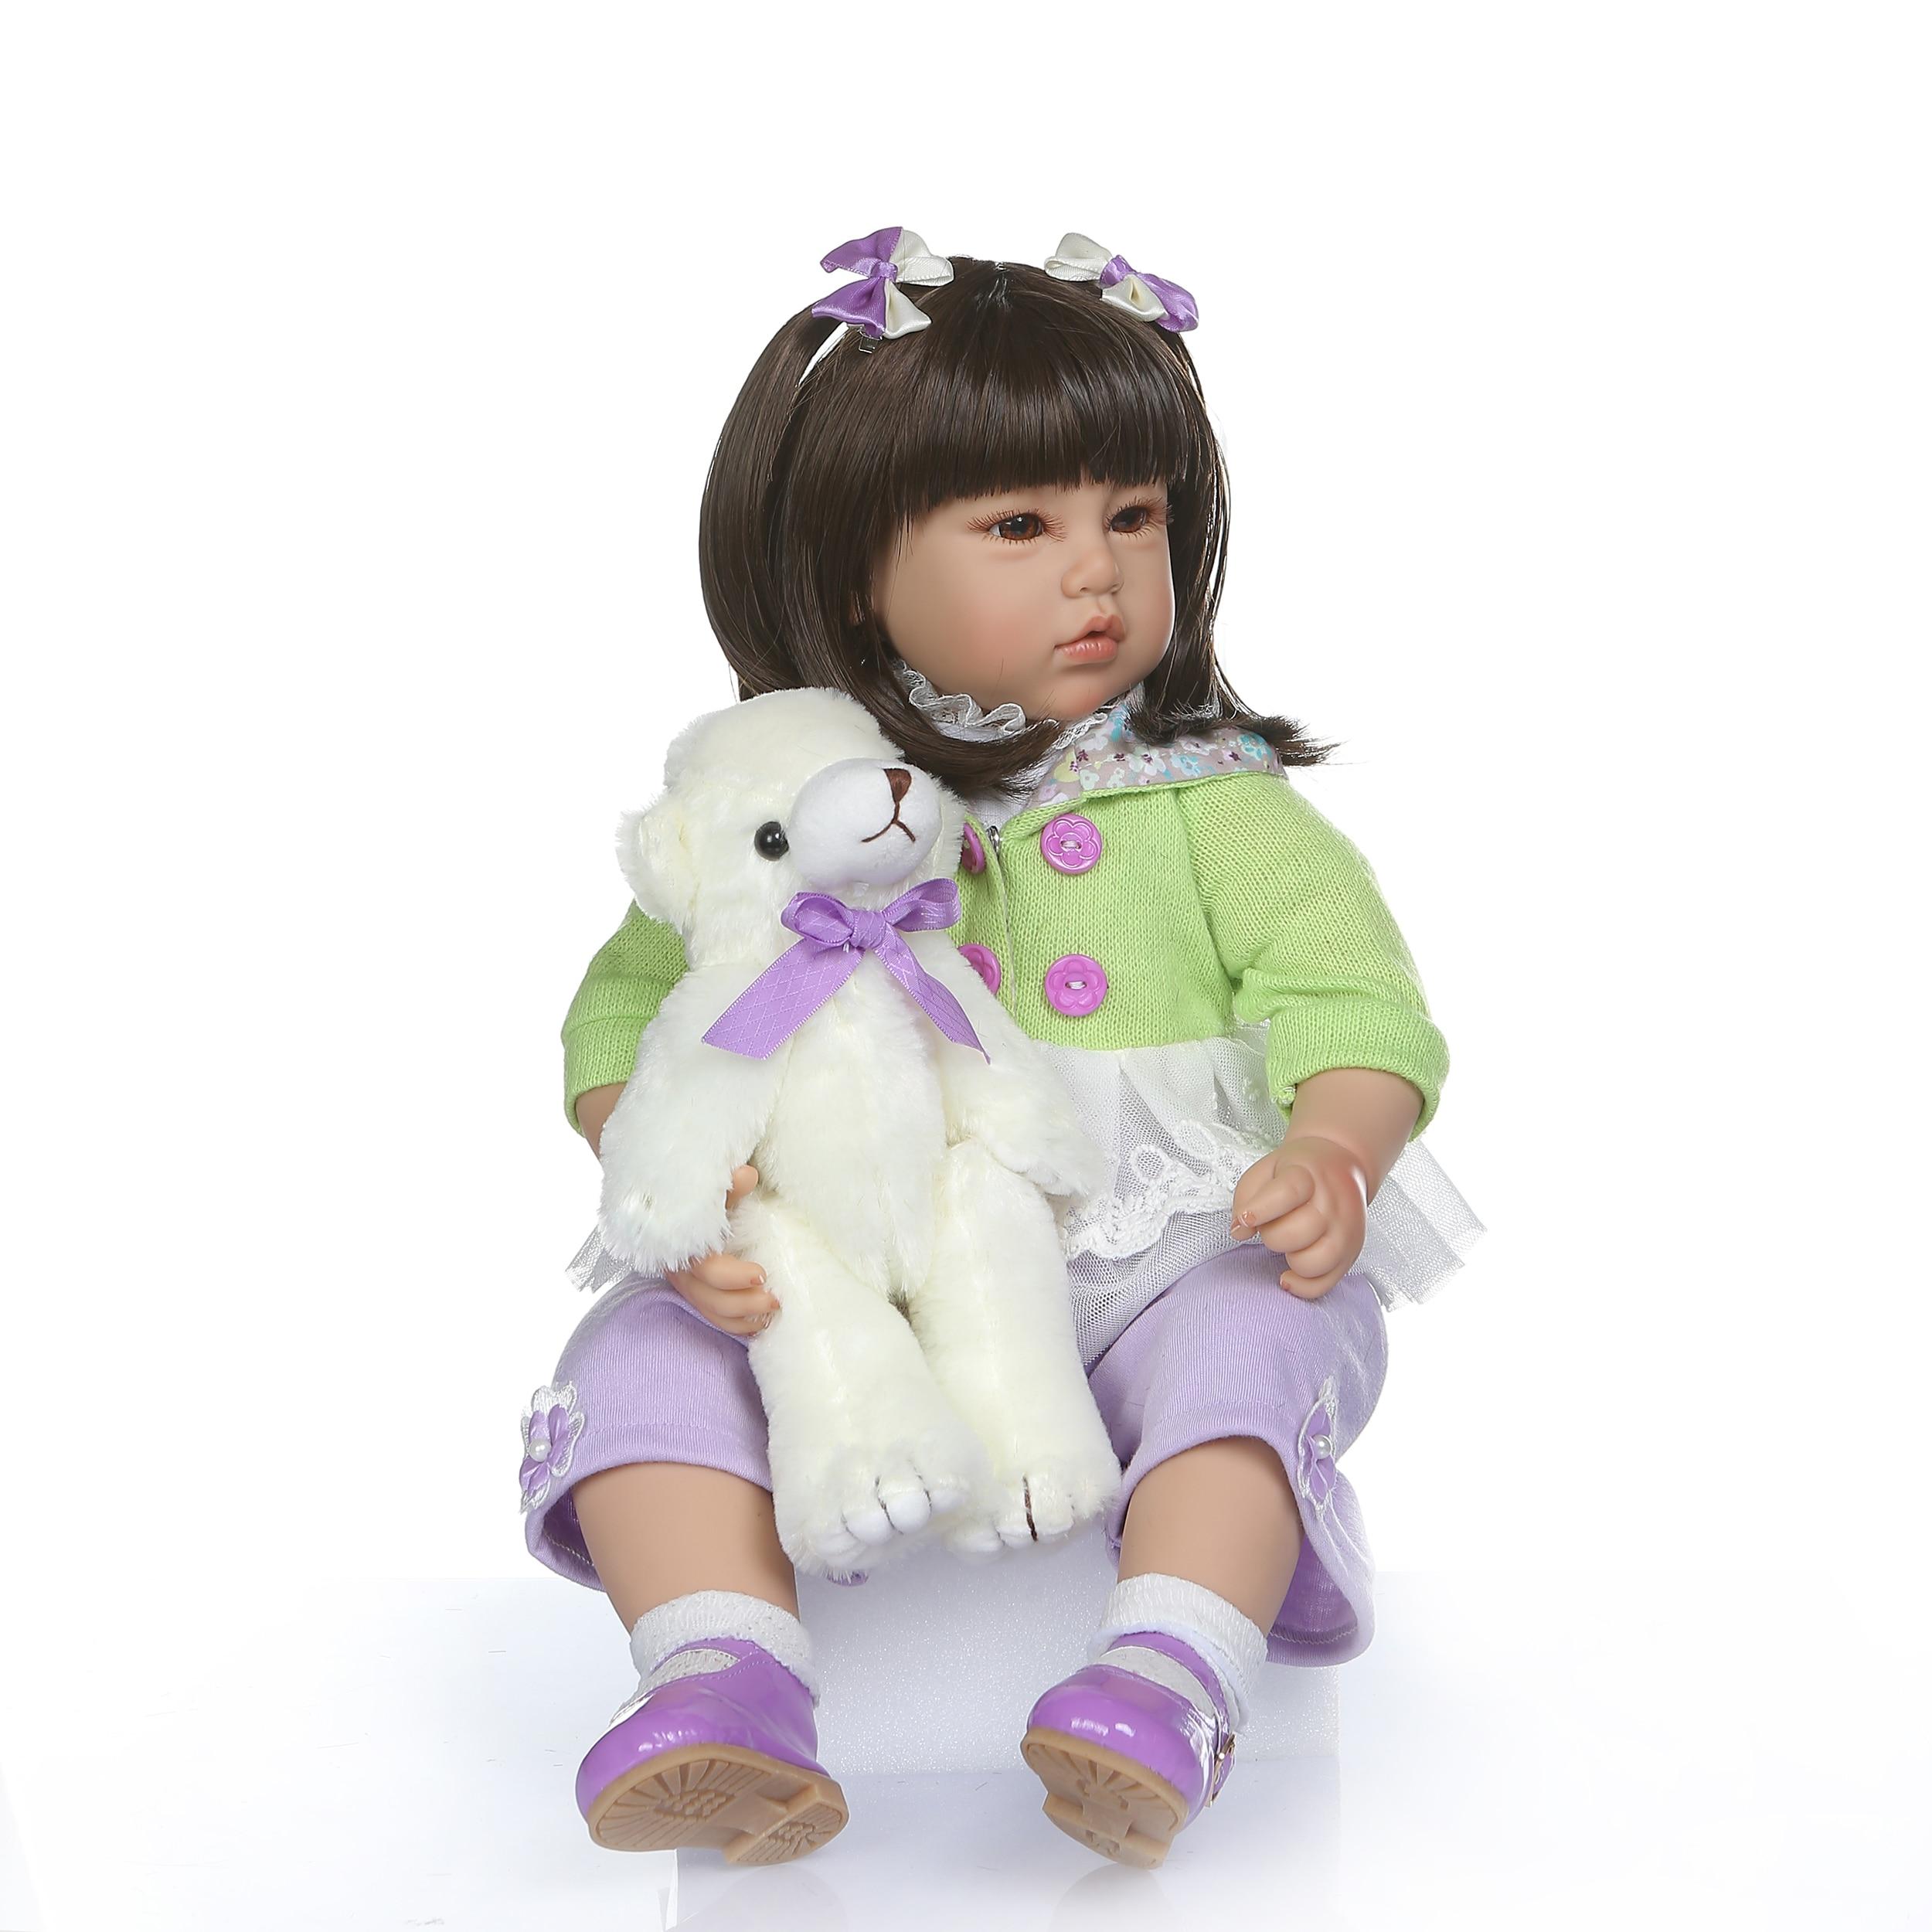 50 cm 진짜 아기 크기 긴 스트레이트 머리 공주 다시 태어난 유아 소녀 인형 아시아 bebe 인형 realista 장난감 어린이 brinquedos-에서인형부터 완구 & 취미 의  그룹 2